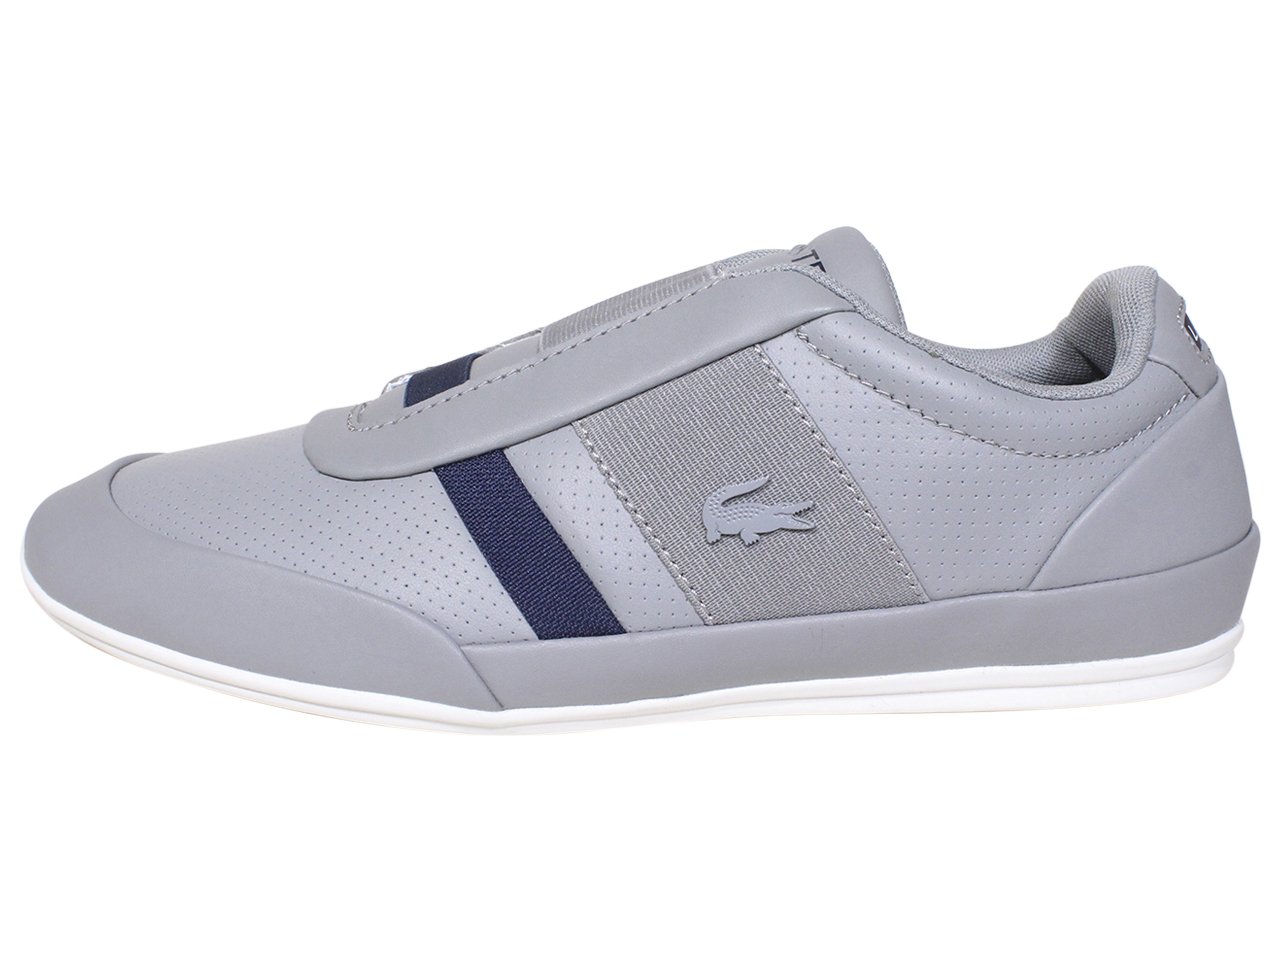 Lacoste-Misano-Elastic-318-Sneakers-Men-039-s-Low-Top-Shoes thumbnail 17